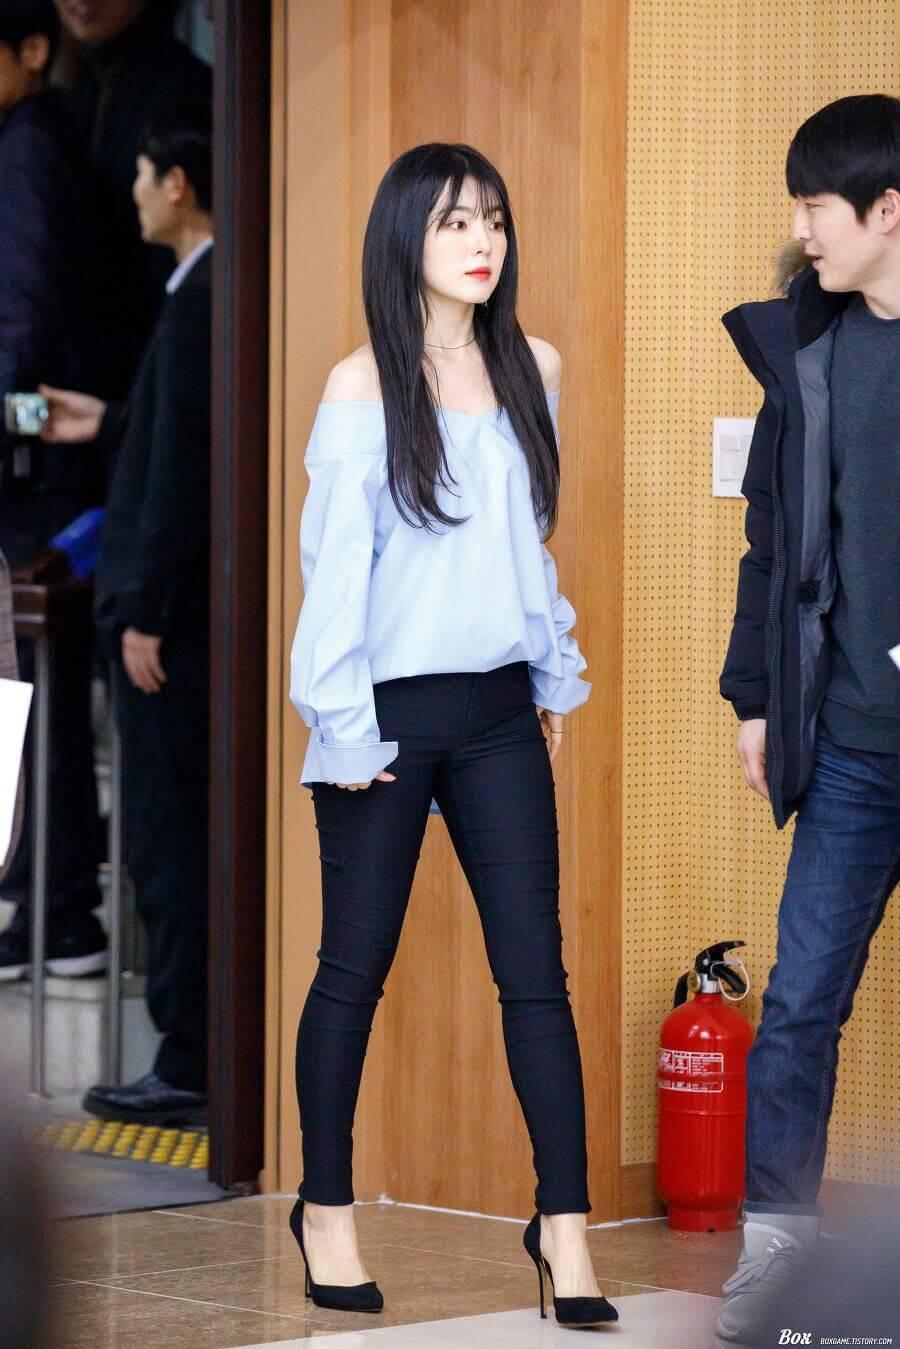 15 Fashion Style Irene Red Velvet Yang Bikin Penampilannya Makin Memukau Inikpop